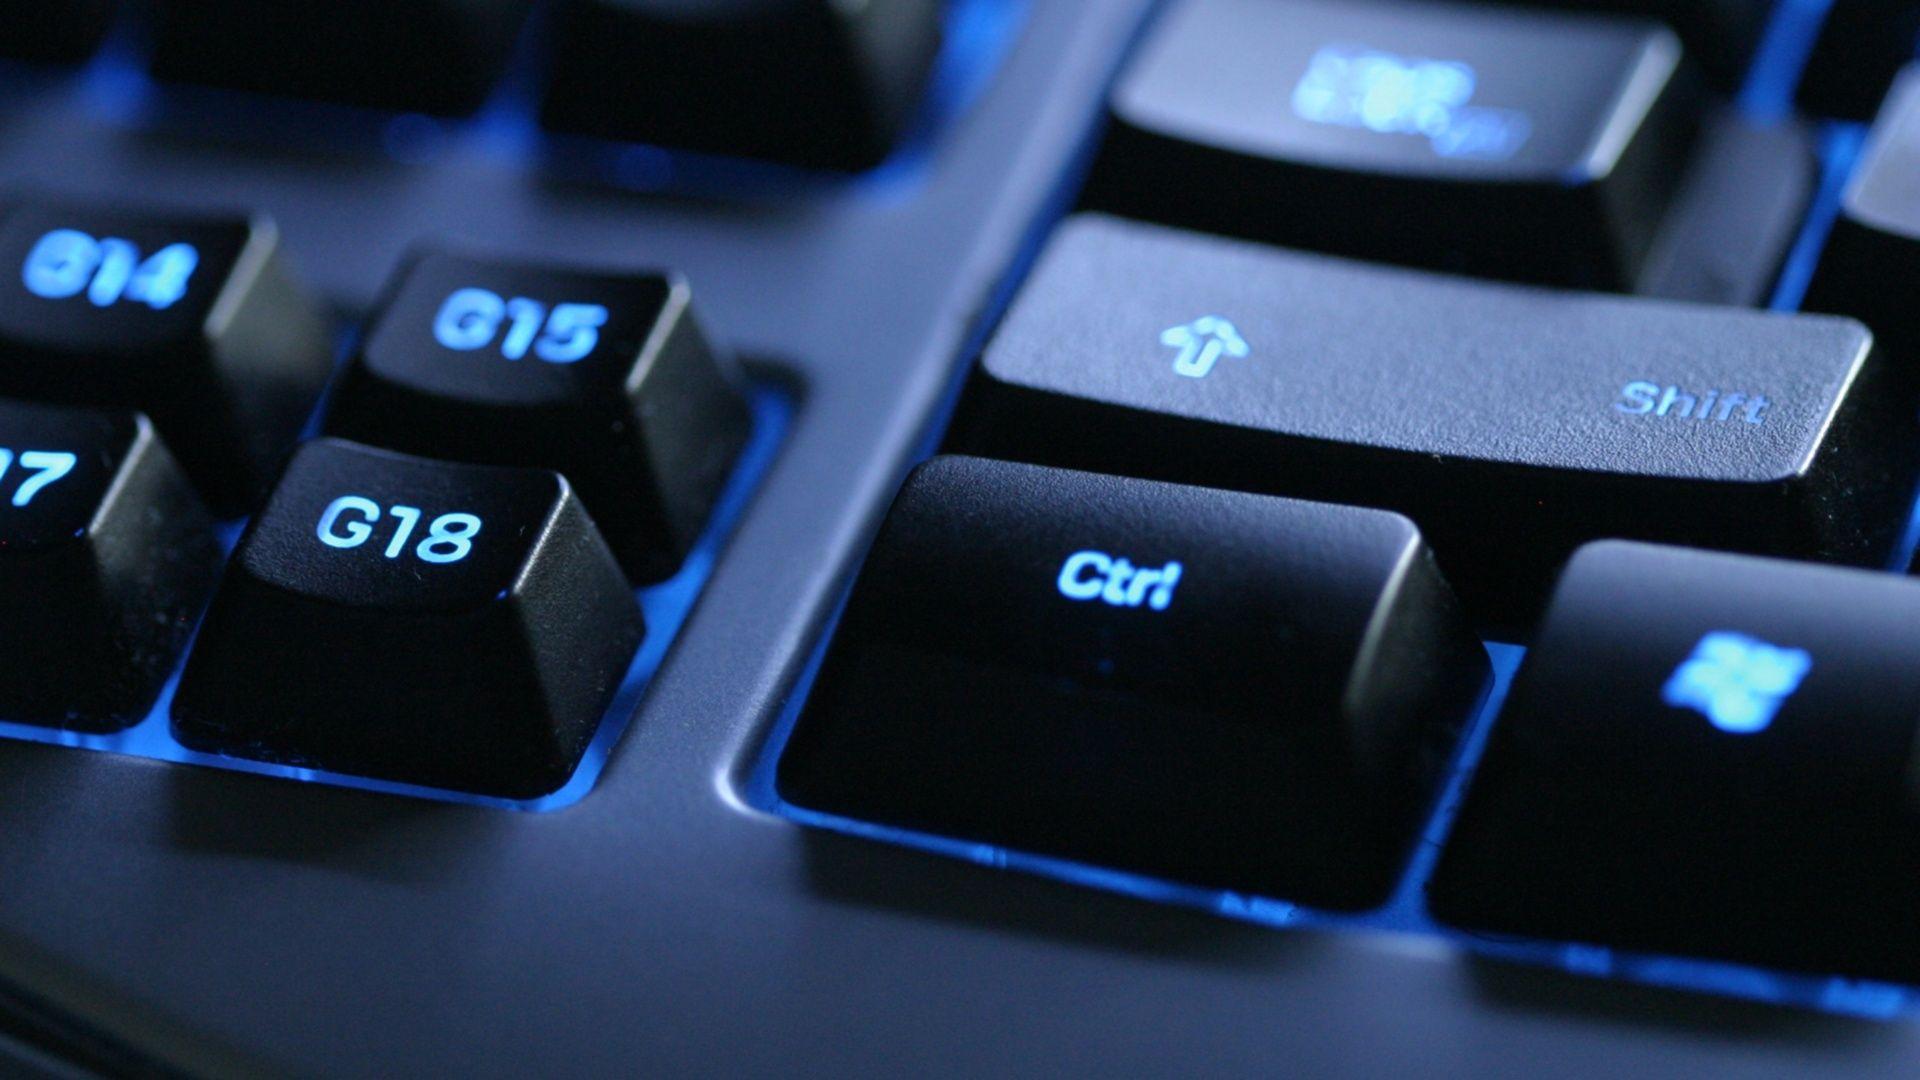 Download Wallpaper 1920x1080 Keyboard Blue Black Button Full Hd 1080p Hd Background